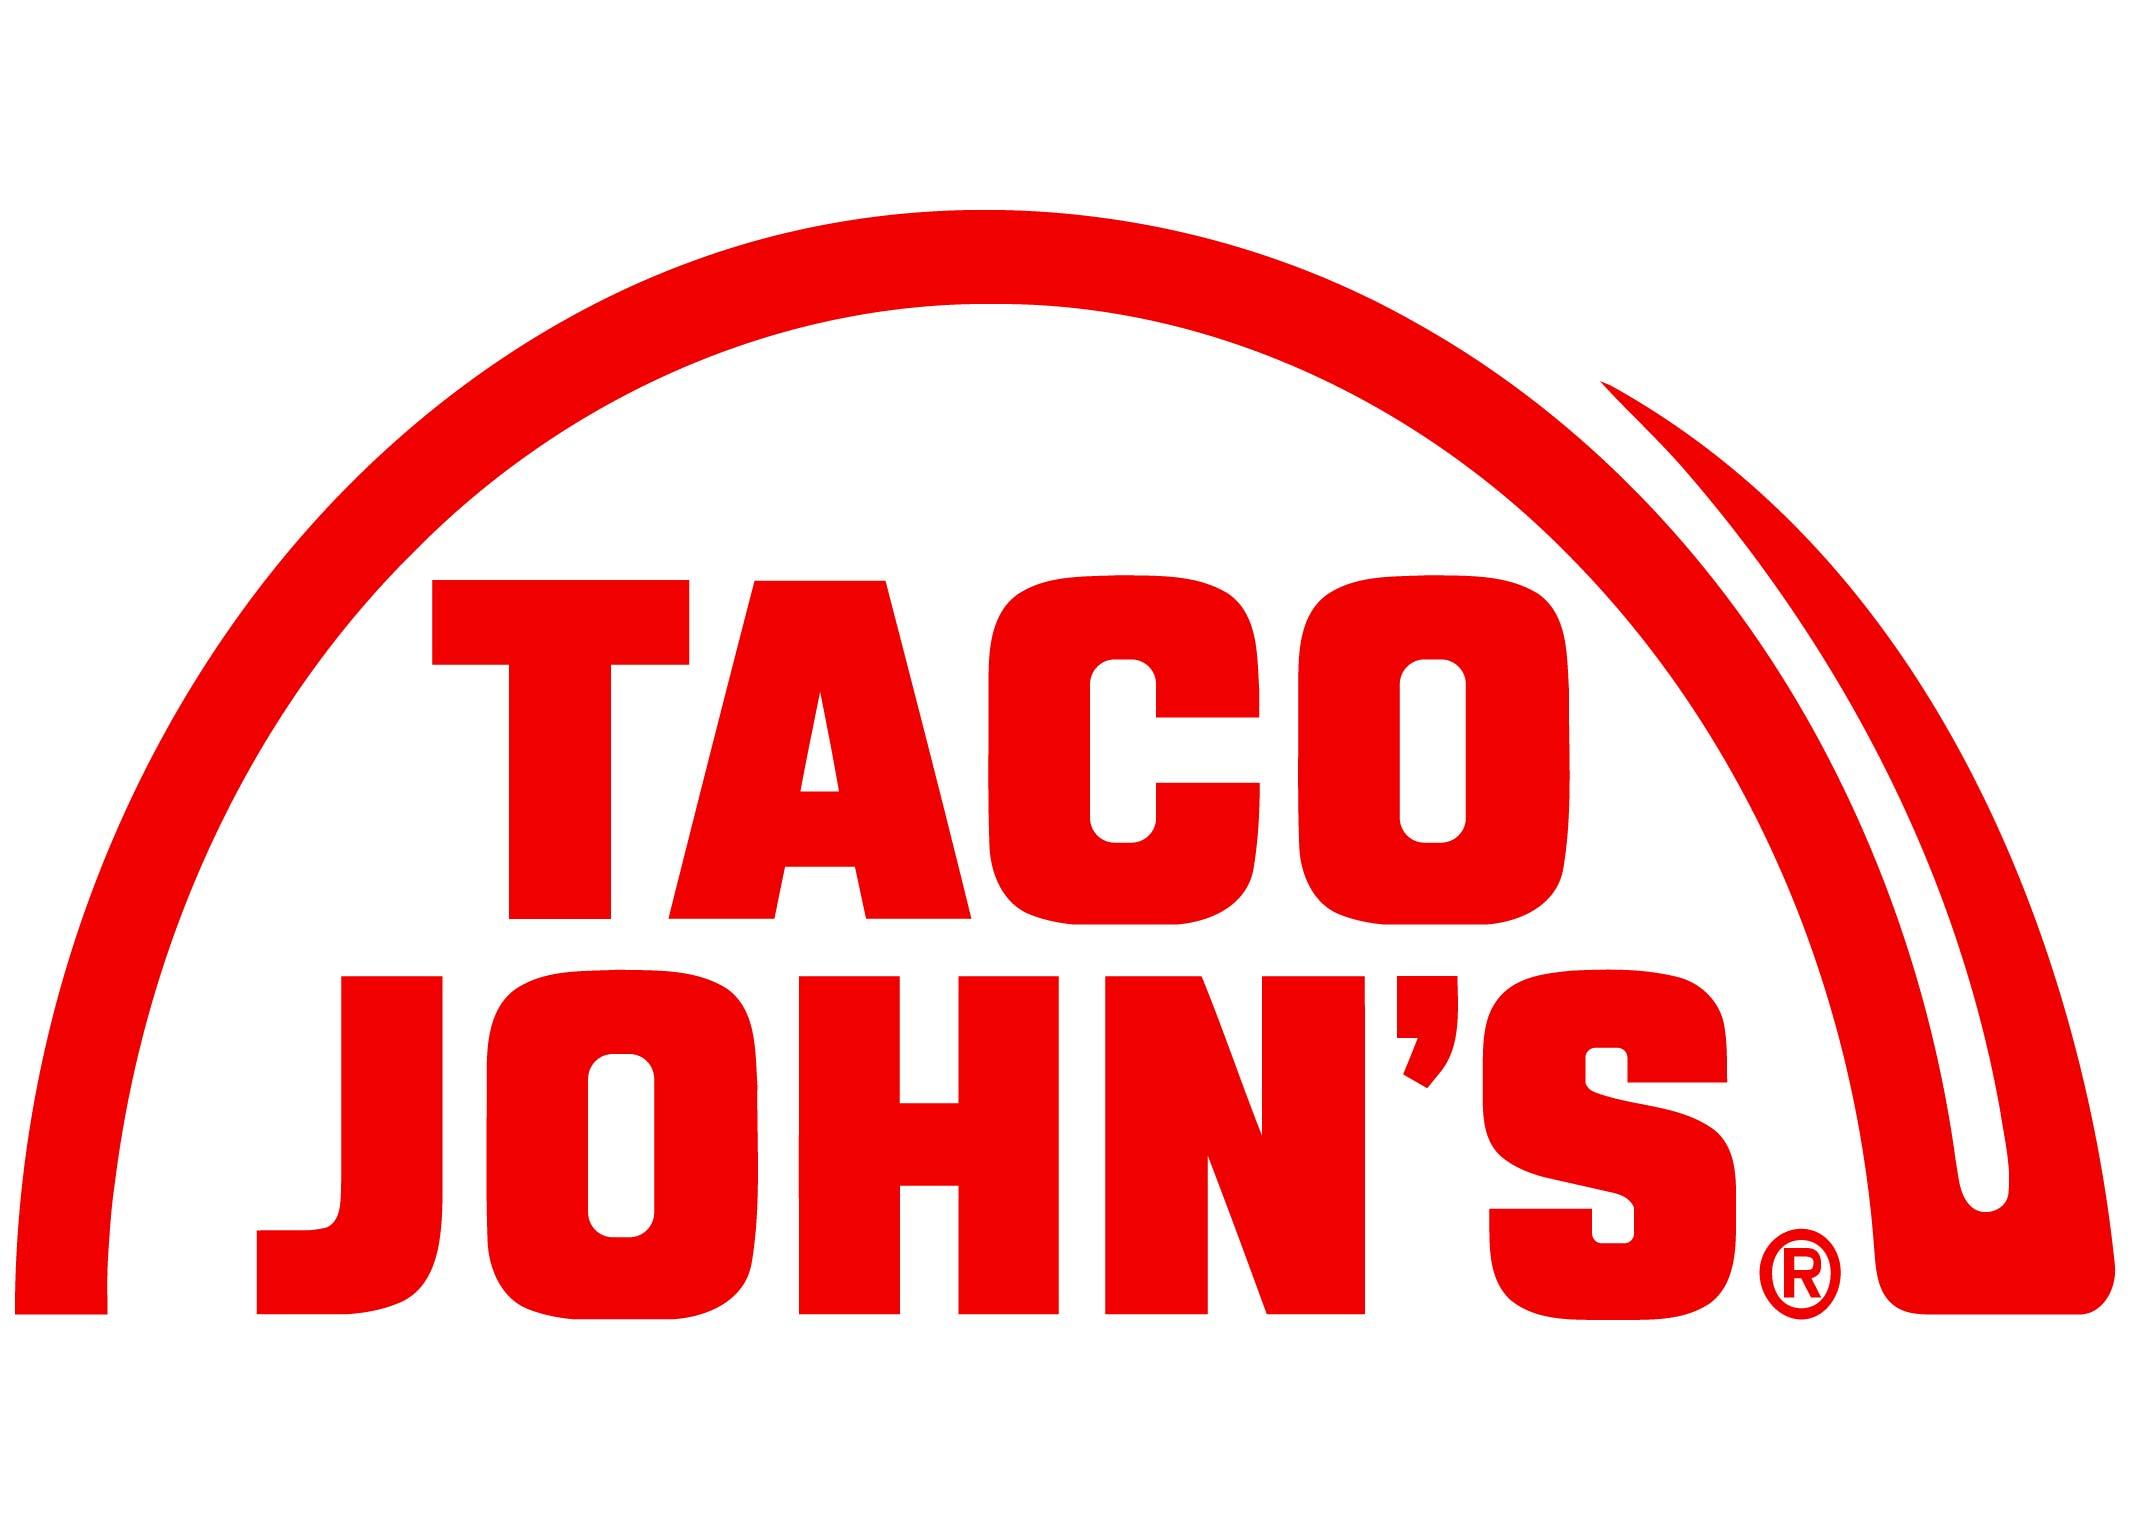 Taco Johns-01.jpg